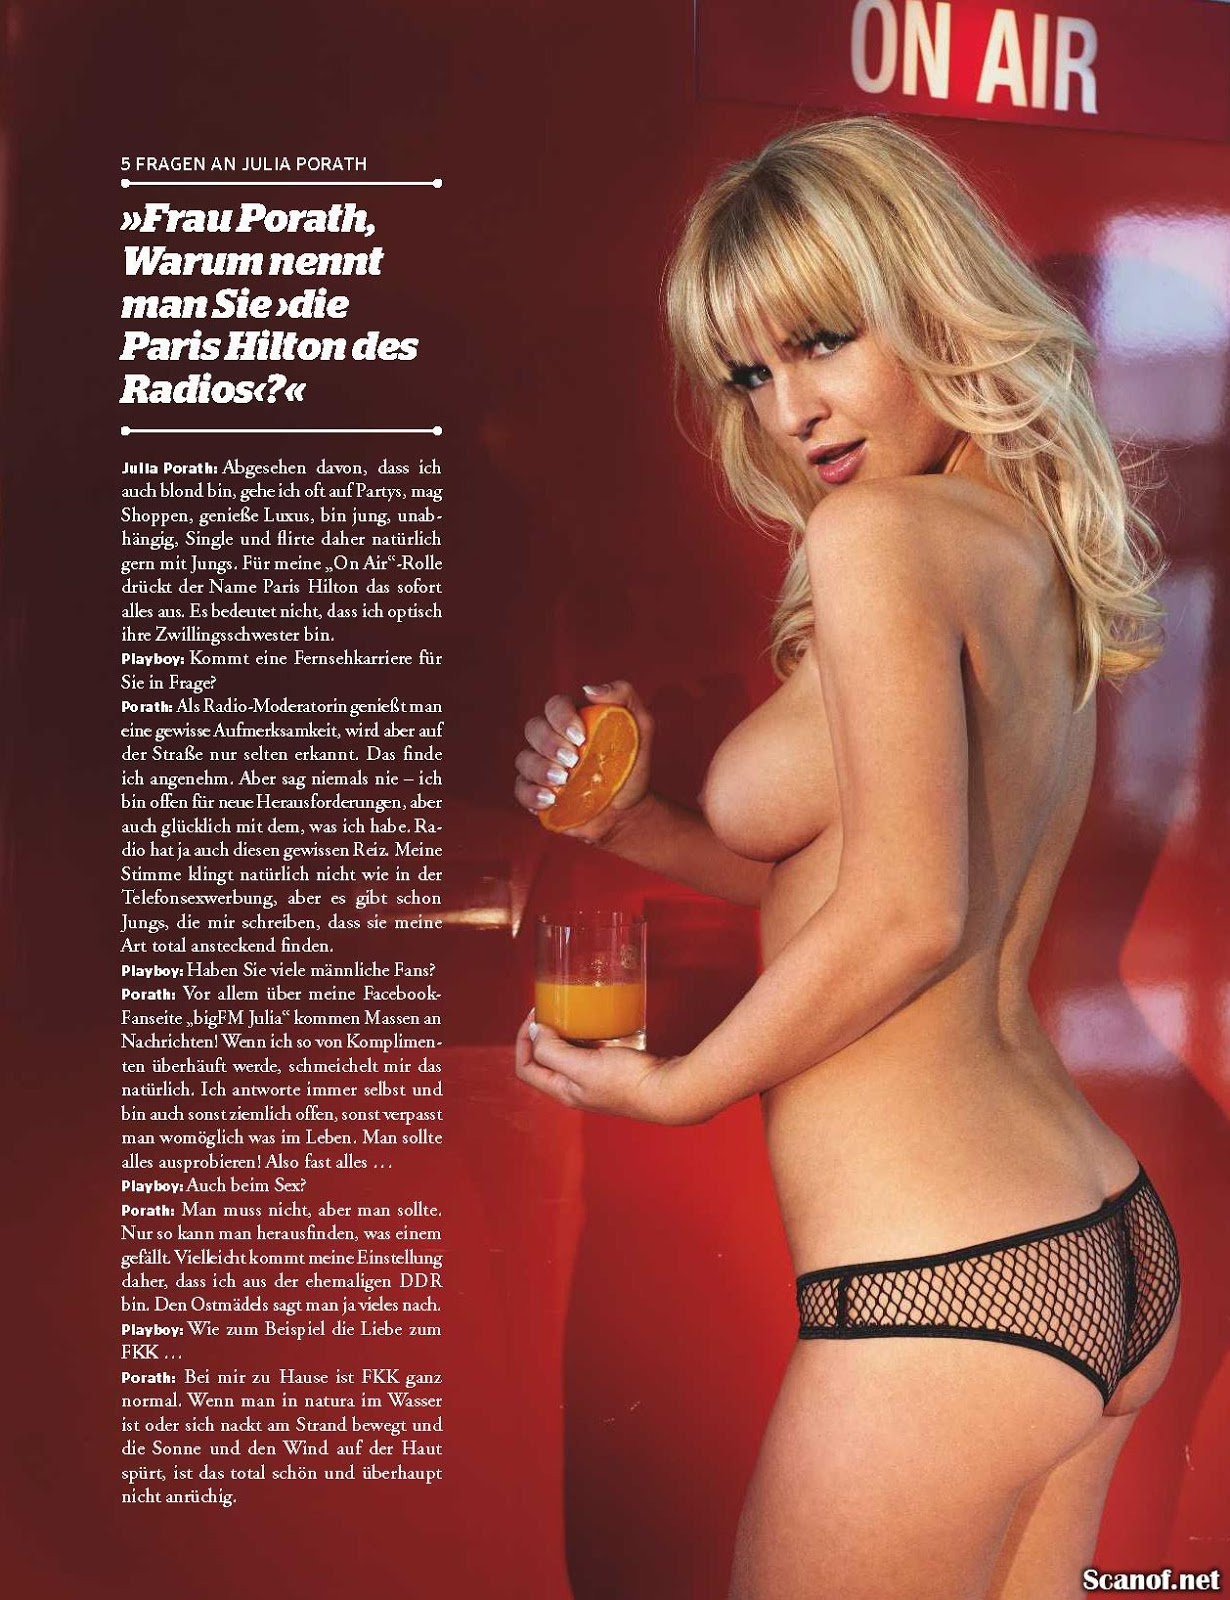 Nackt julia porath How to